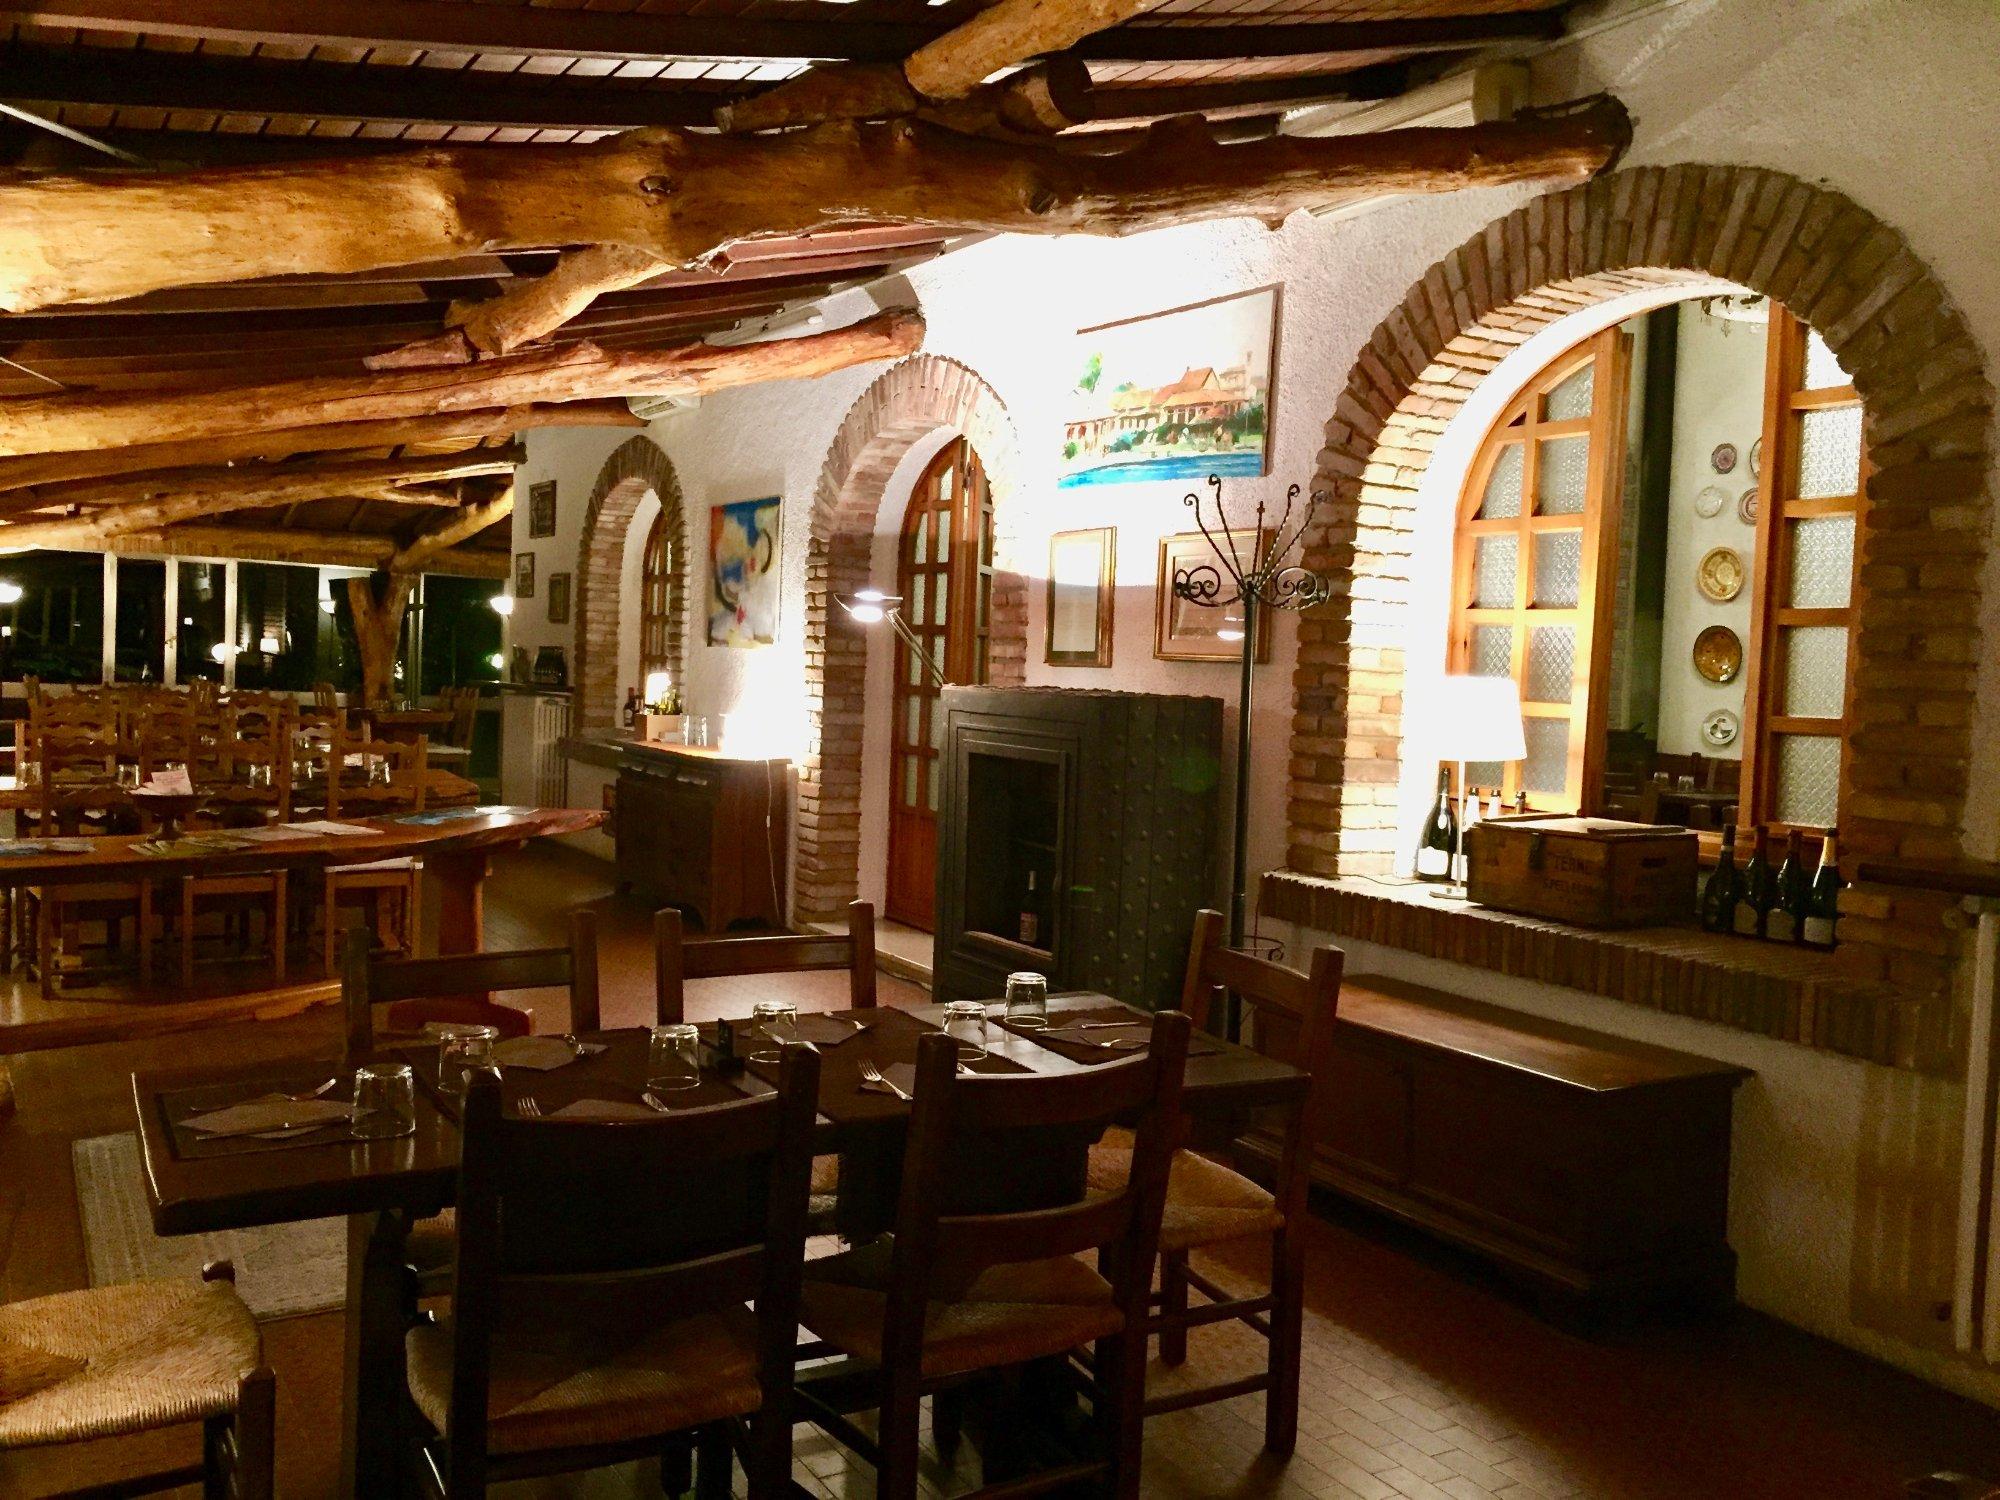 Most Popular Contemporary food in Volta Mantovana, Province of Mantua, Italy